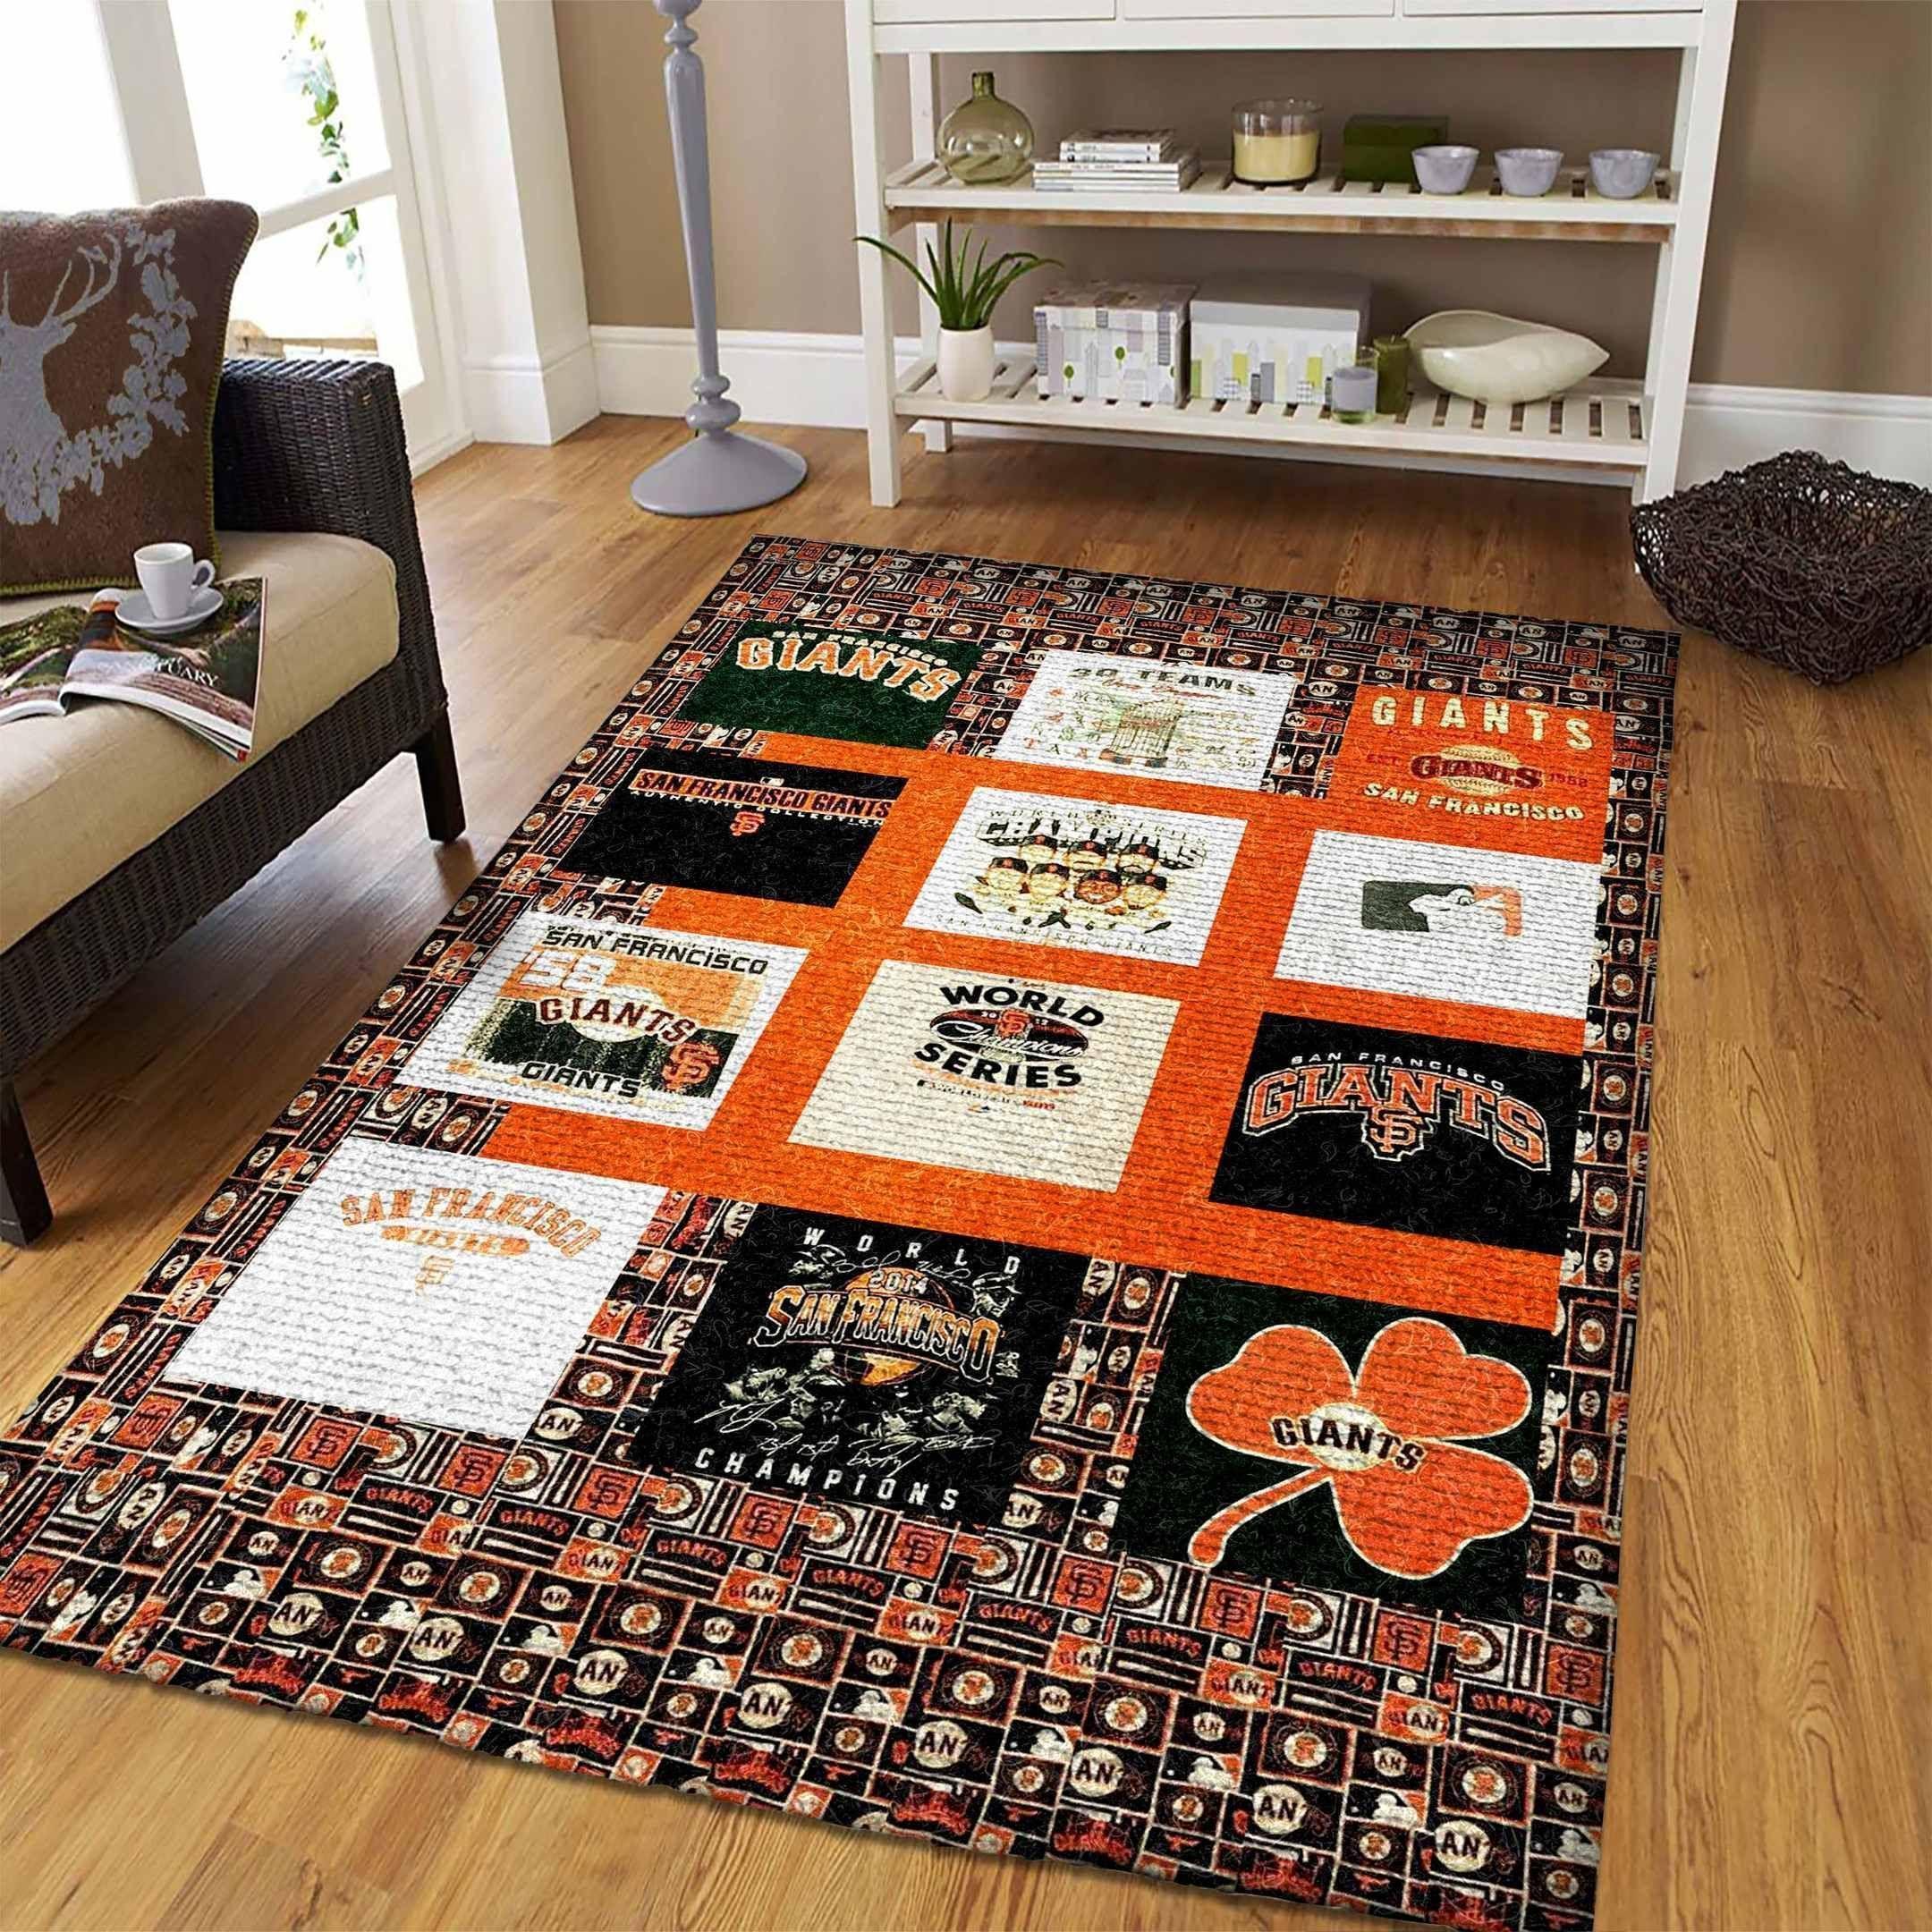 Amazon San Francisco Giants Living Room Area No4927 Rug